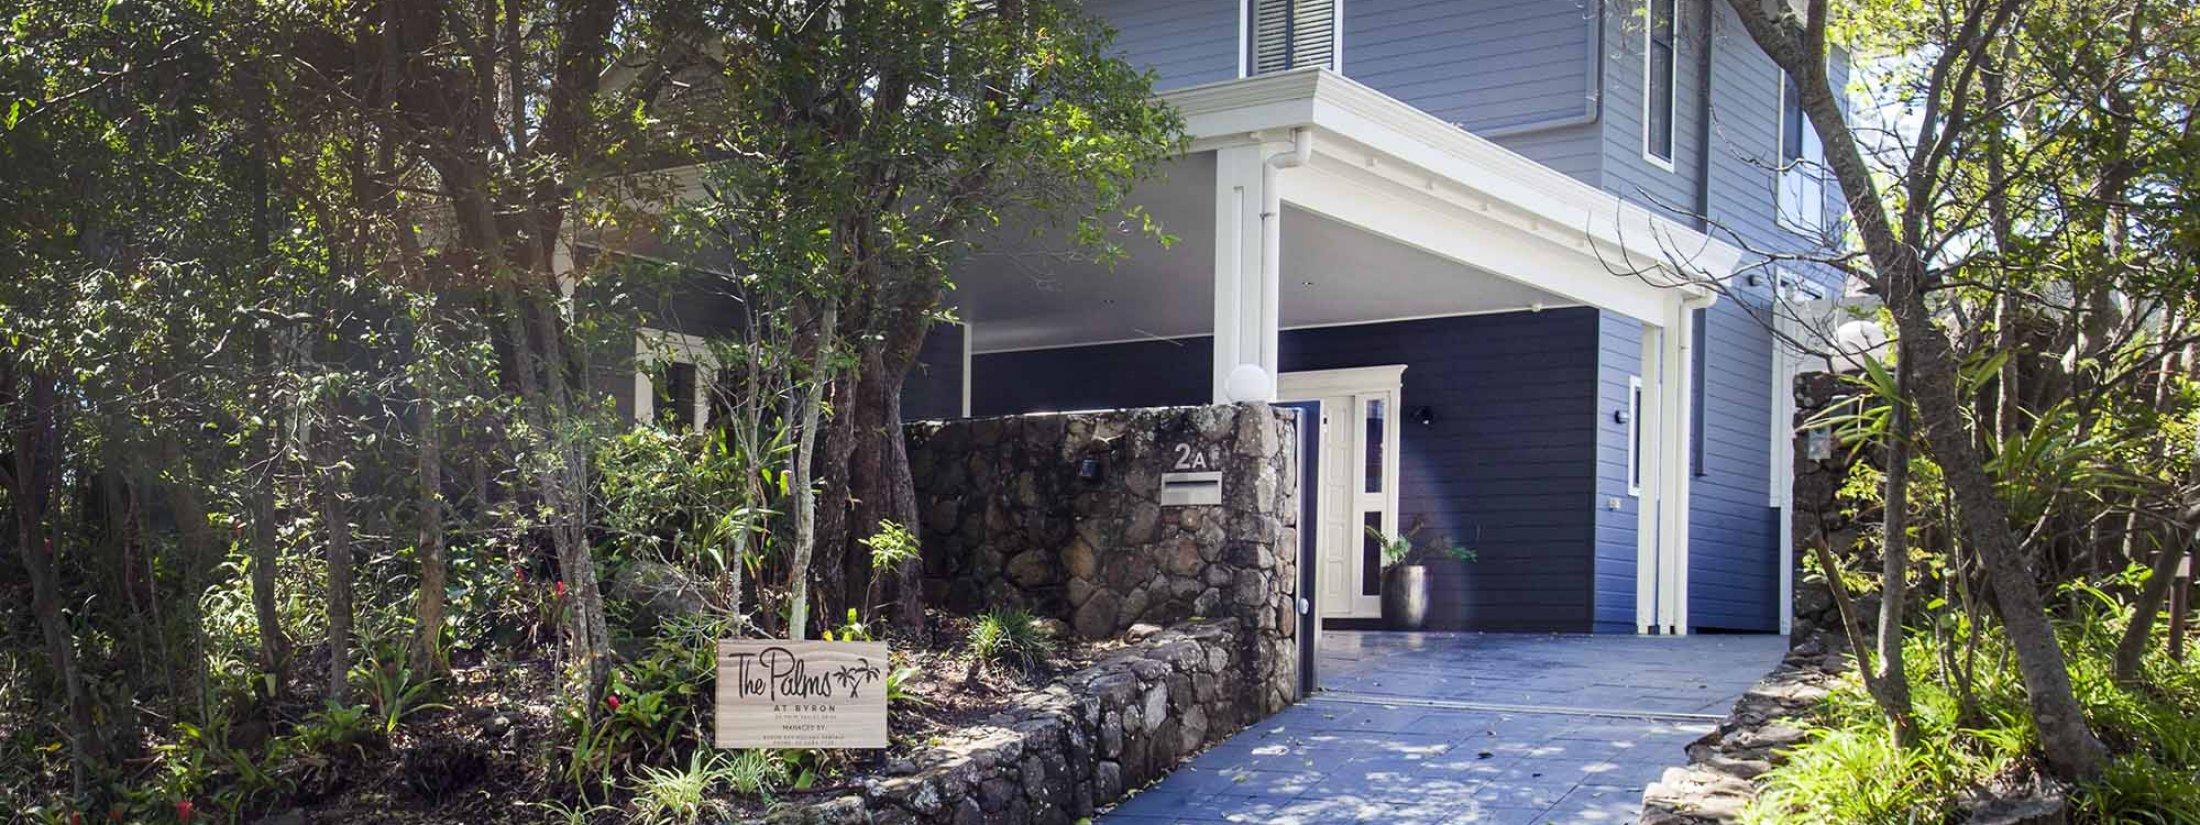 The Palms at Byron - Byron Bay - Driveway and entrance